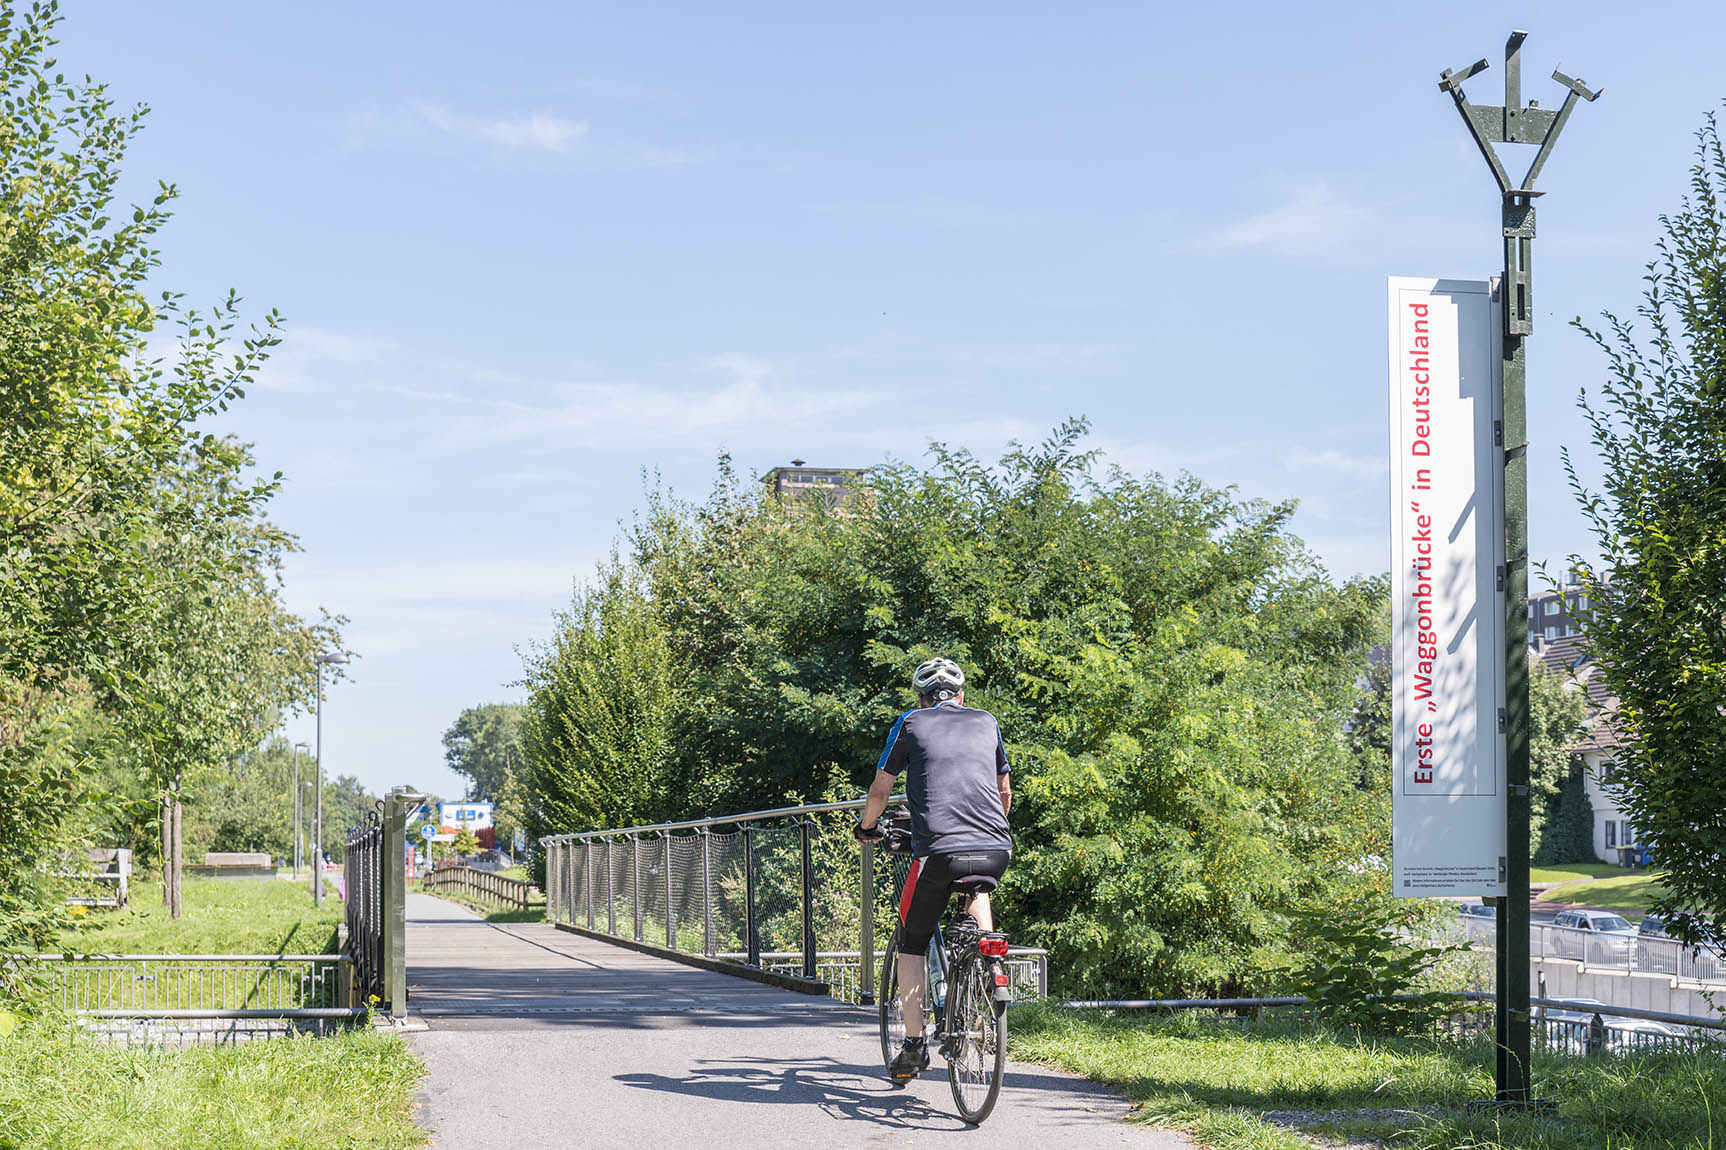 Niederbergbahn, Alleenradweg